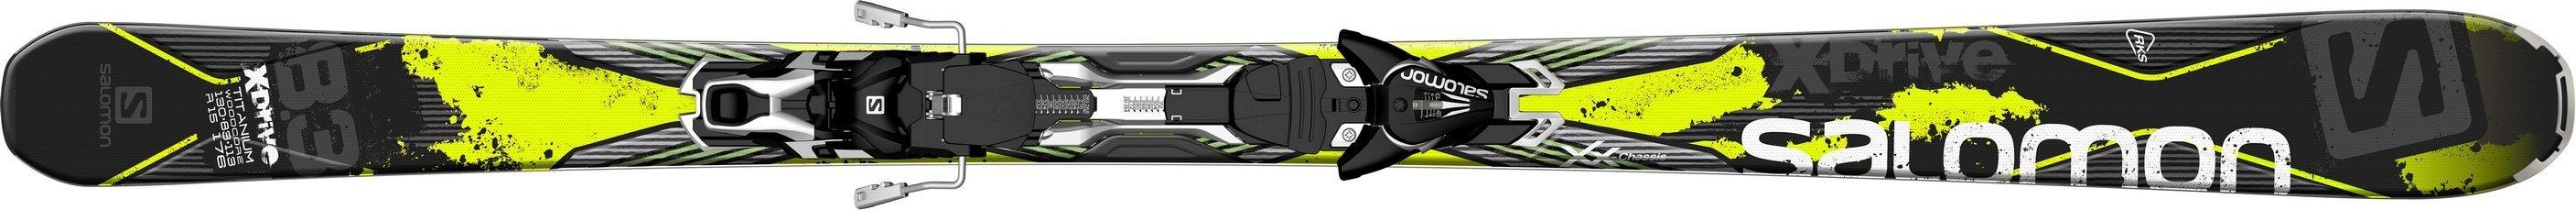 X-DRIVE 8.3